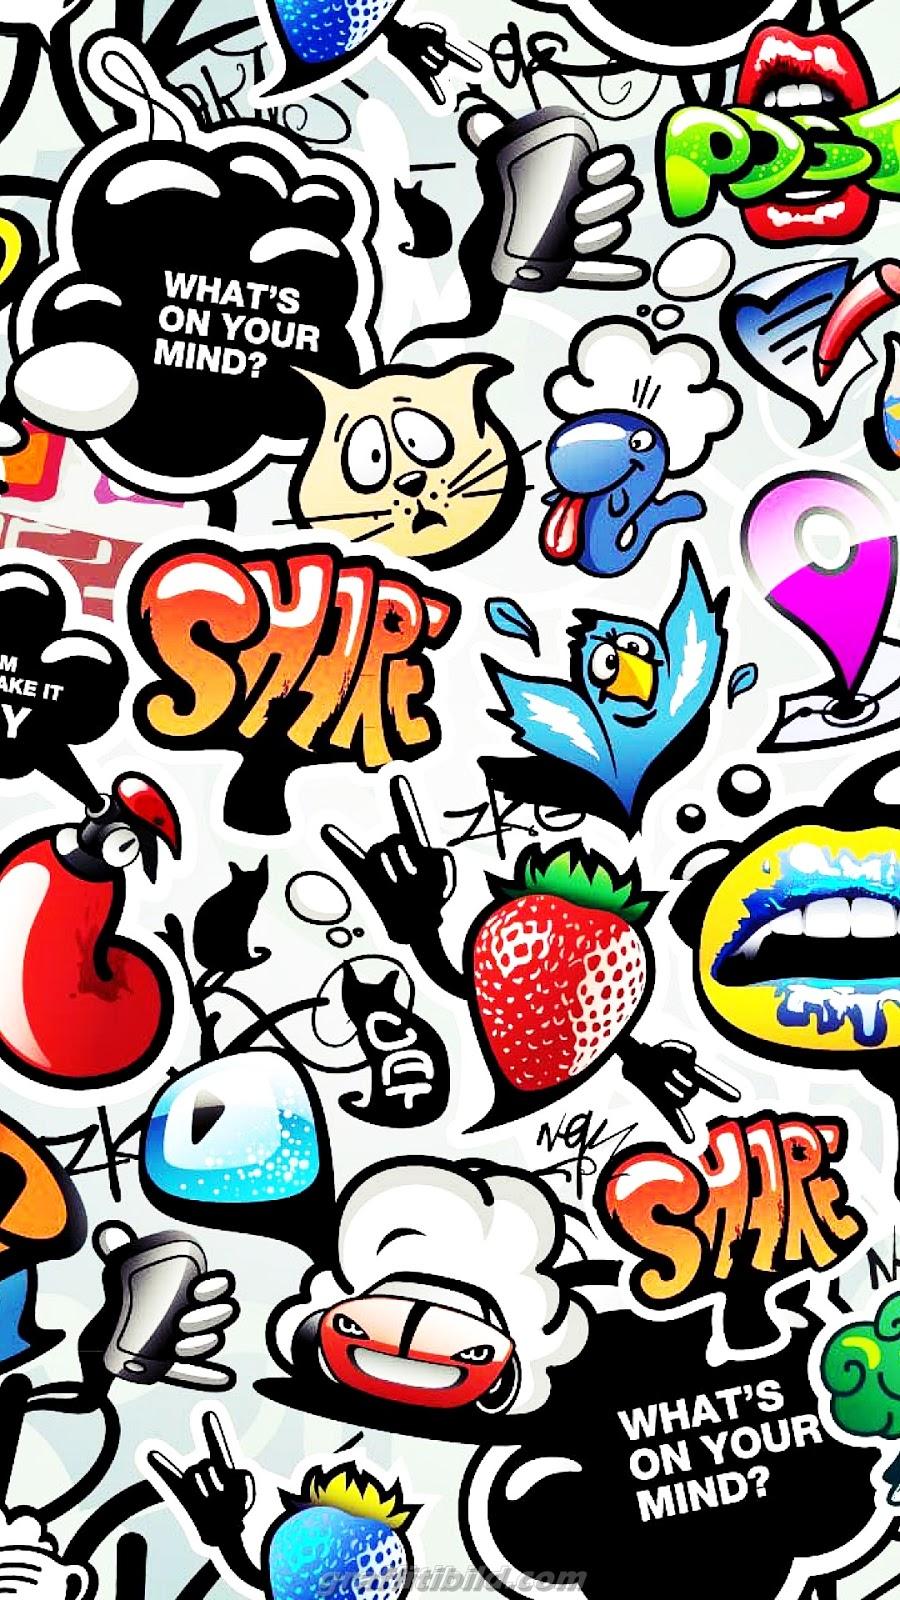 graffiti wallpapers android hd, graffiti hintergrundbilder handy